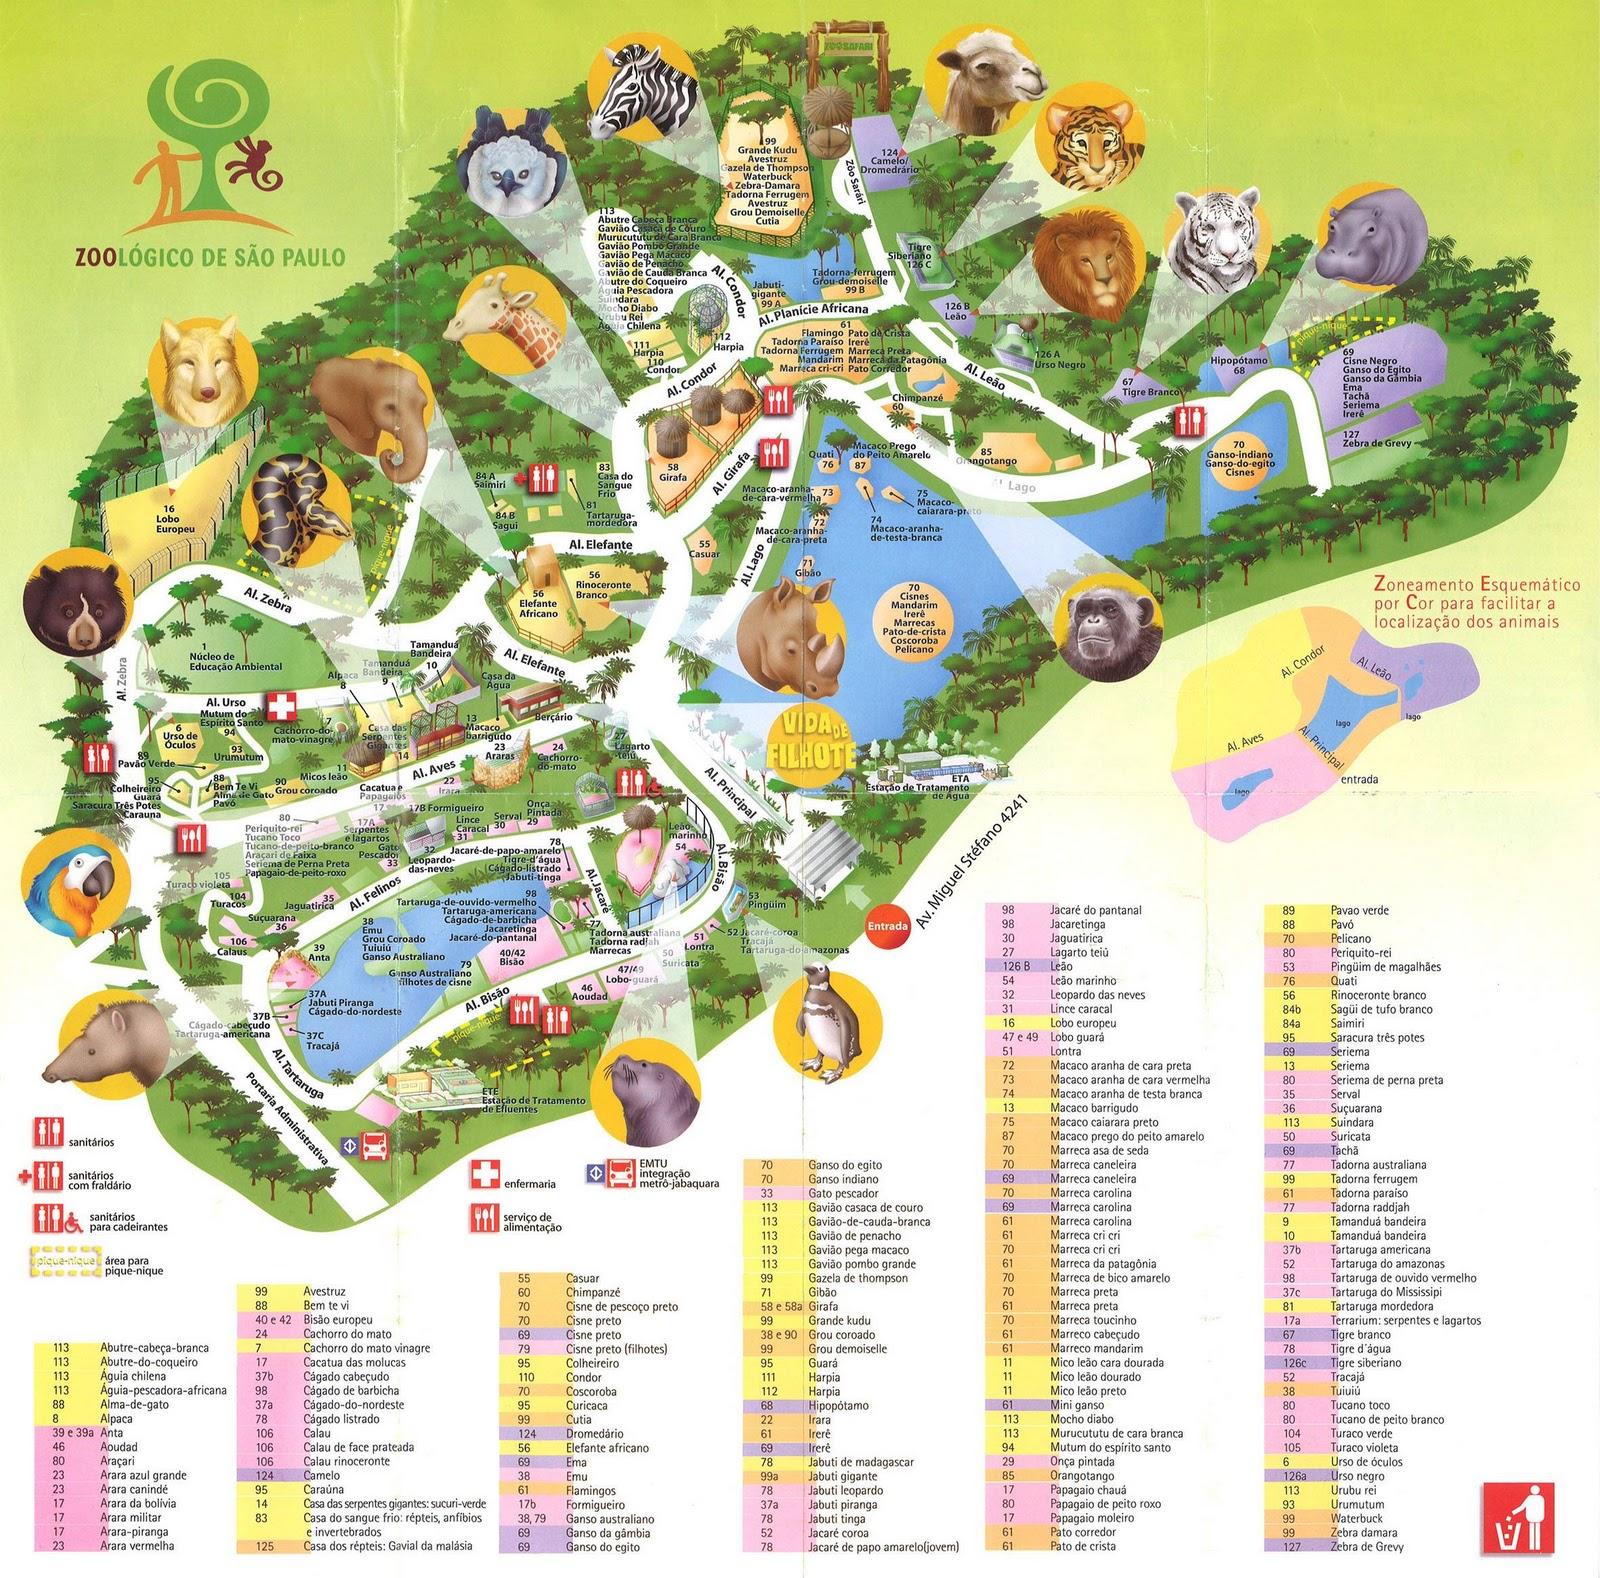 Santiago De Chile Mapa Turistico.Mapa Turistico Santiago Chile Pdf Needax S Blog